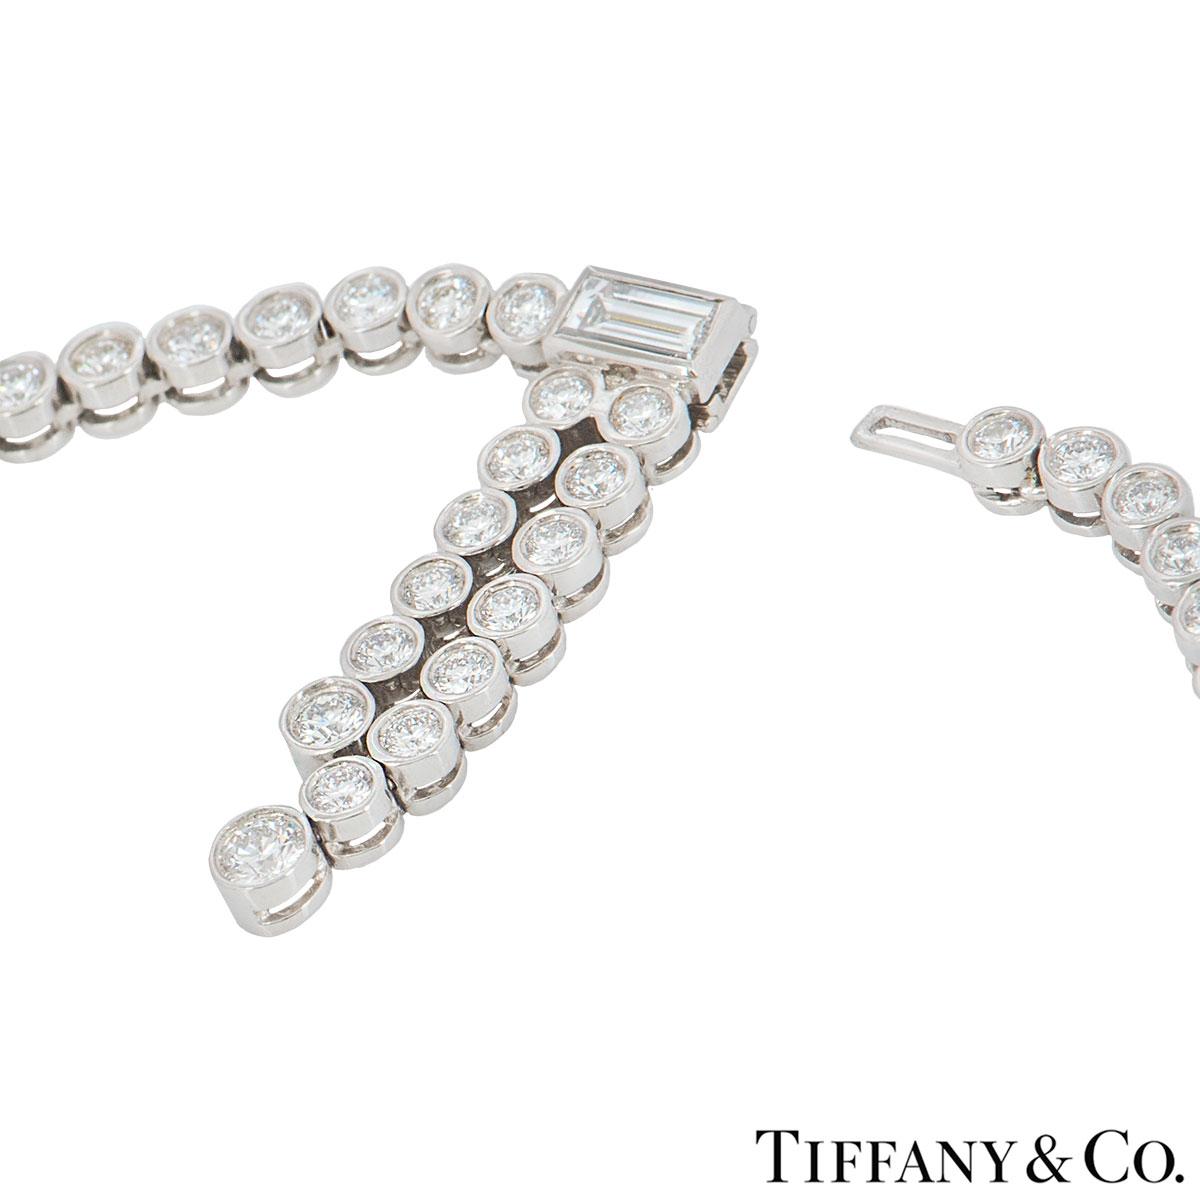 Tiffany & Co. Platinum Diamond Jazz Necklace